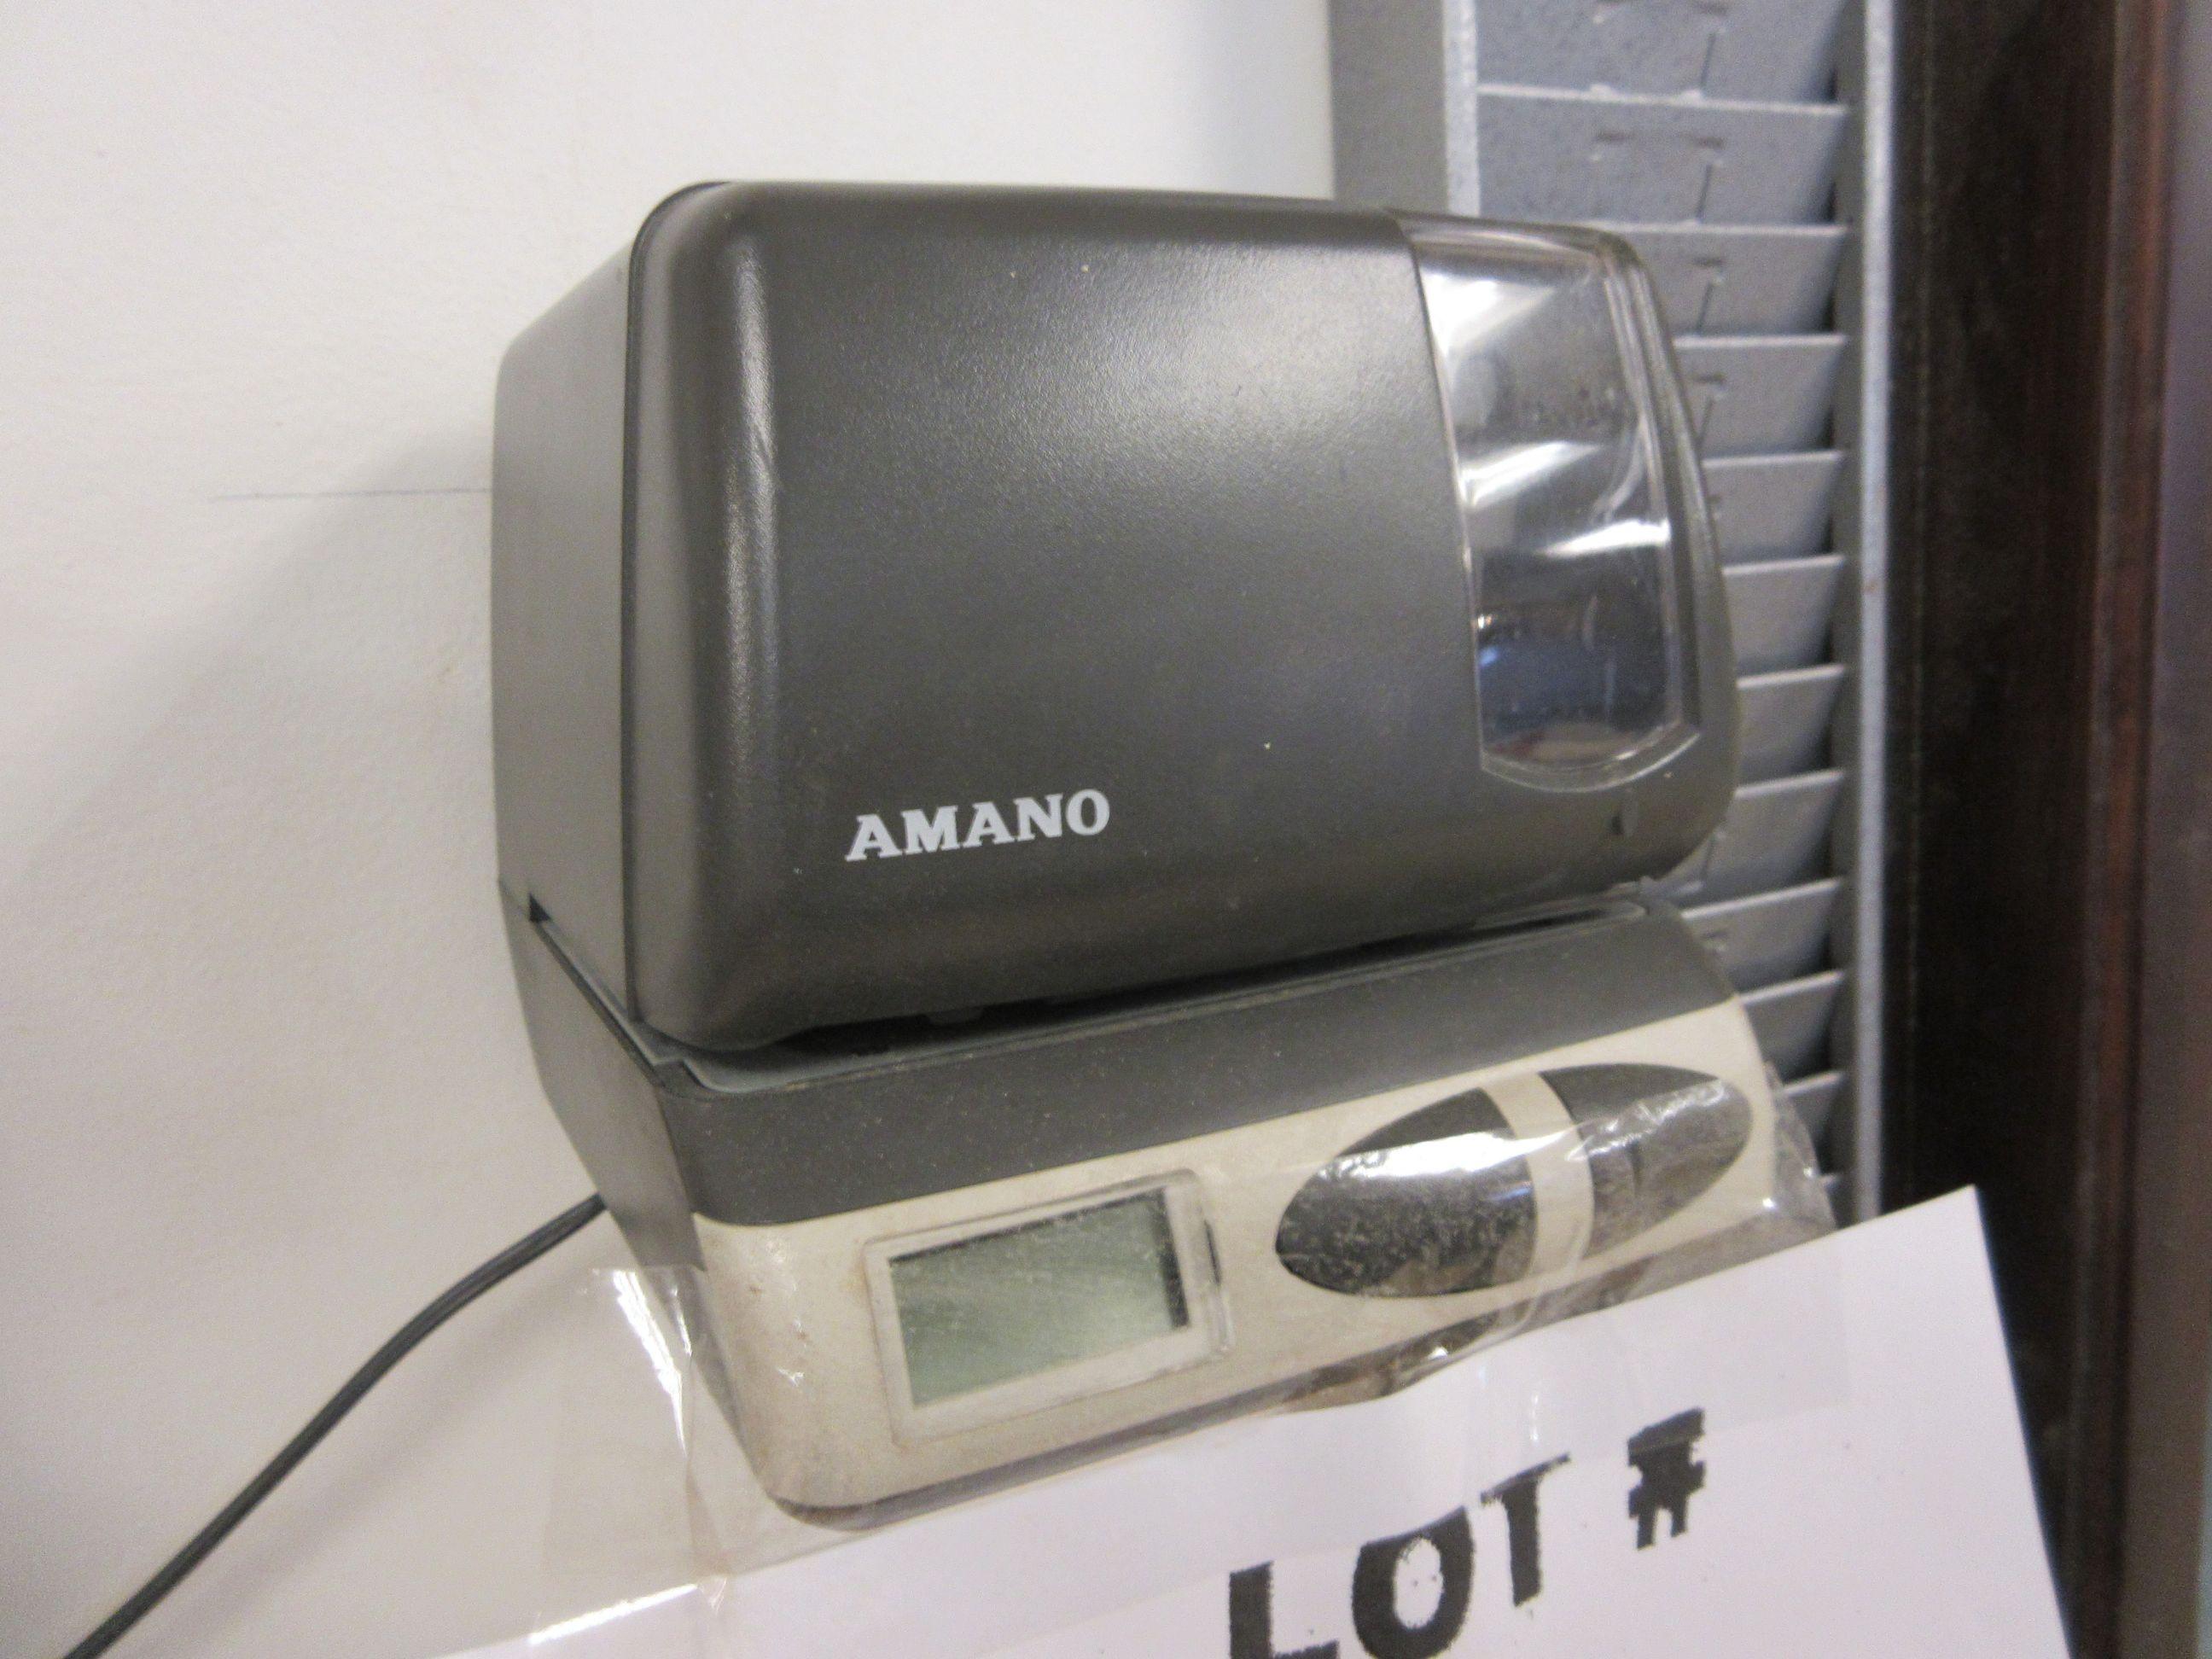 AMANO punch clock - Image 2 of 2